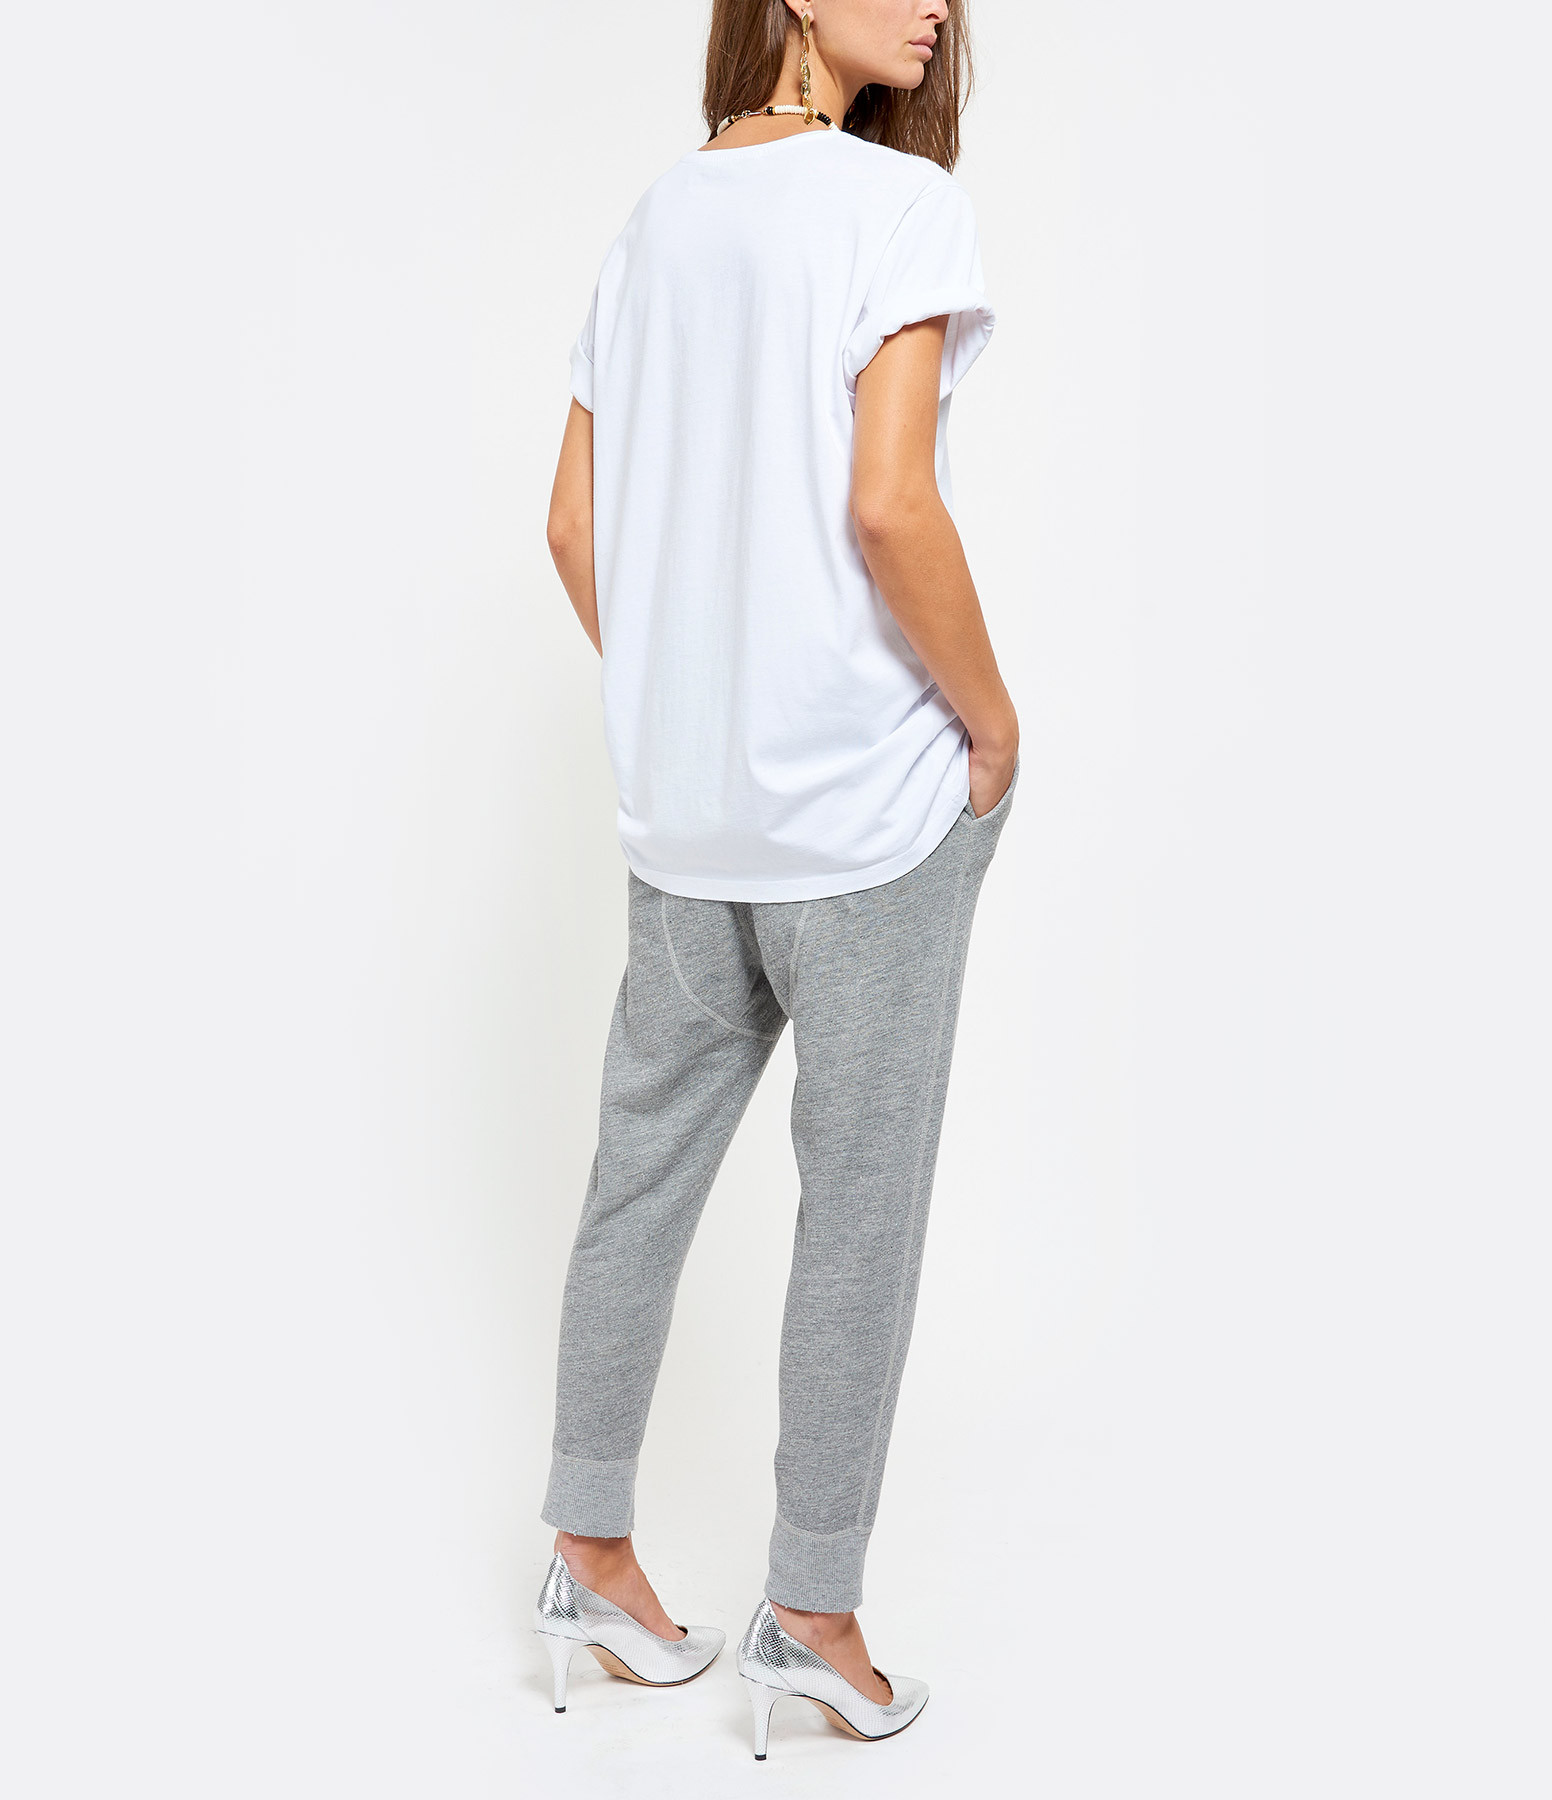 GOLDEN GOOSE - Tee-shirt Ania Coton Rainbow Blanc